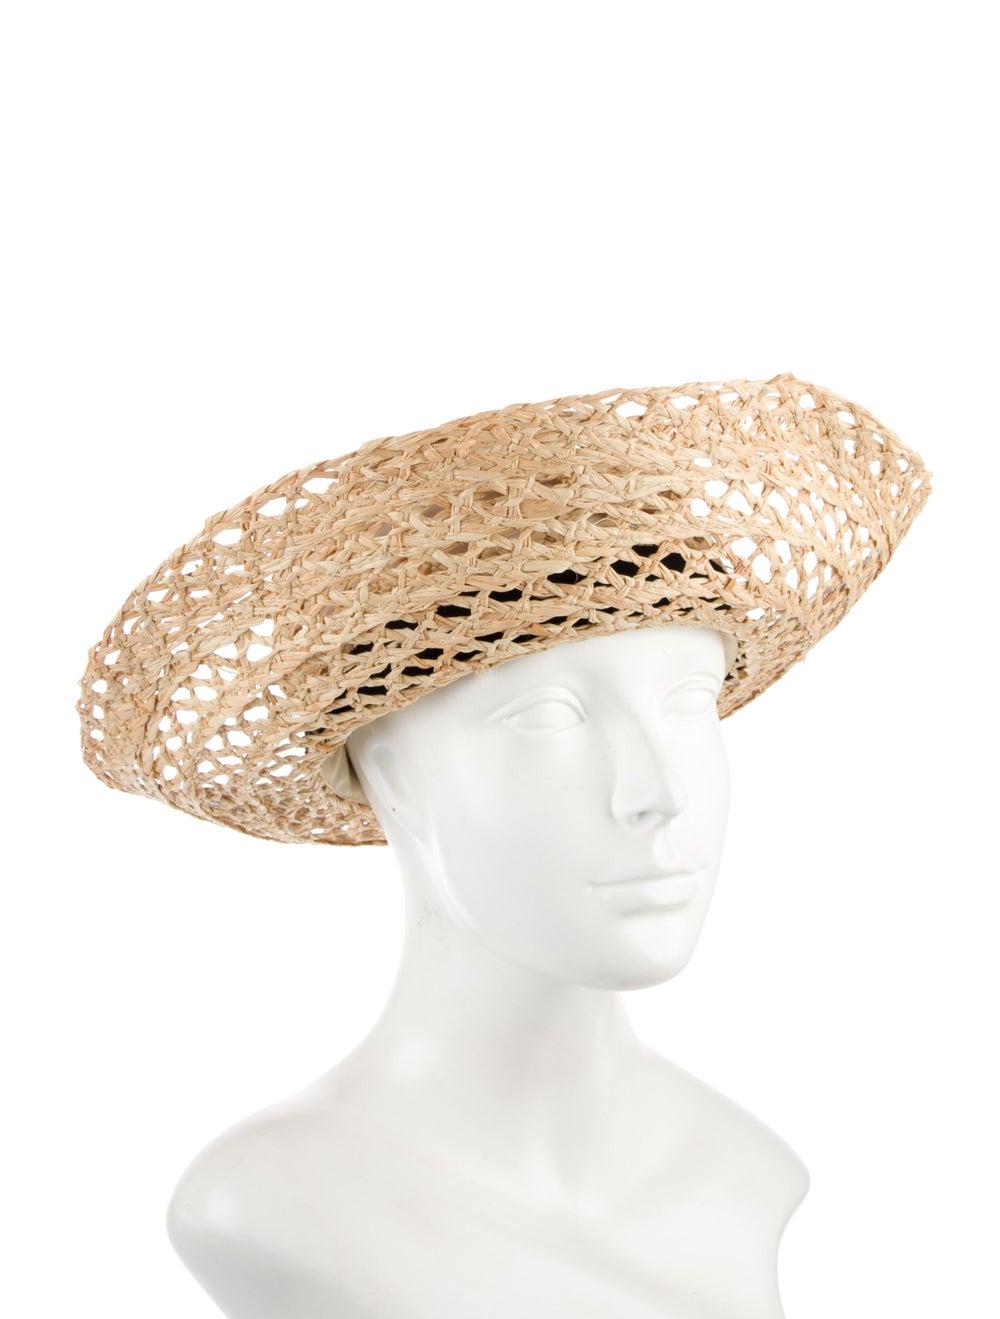 Tory Burch Wide Brim Straw Hat Tan - image 3